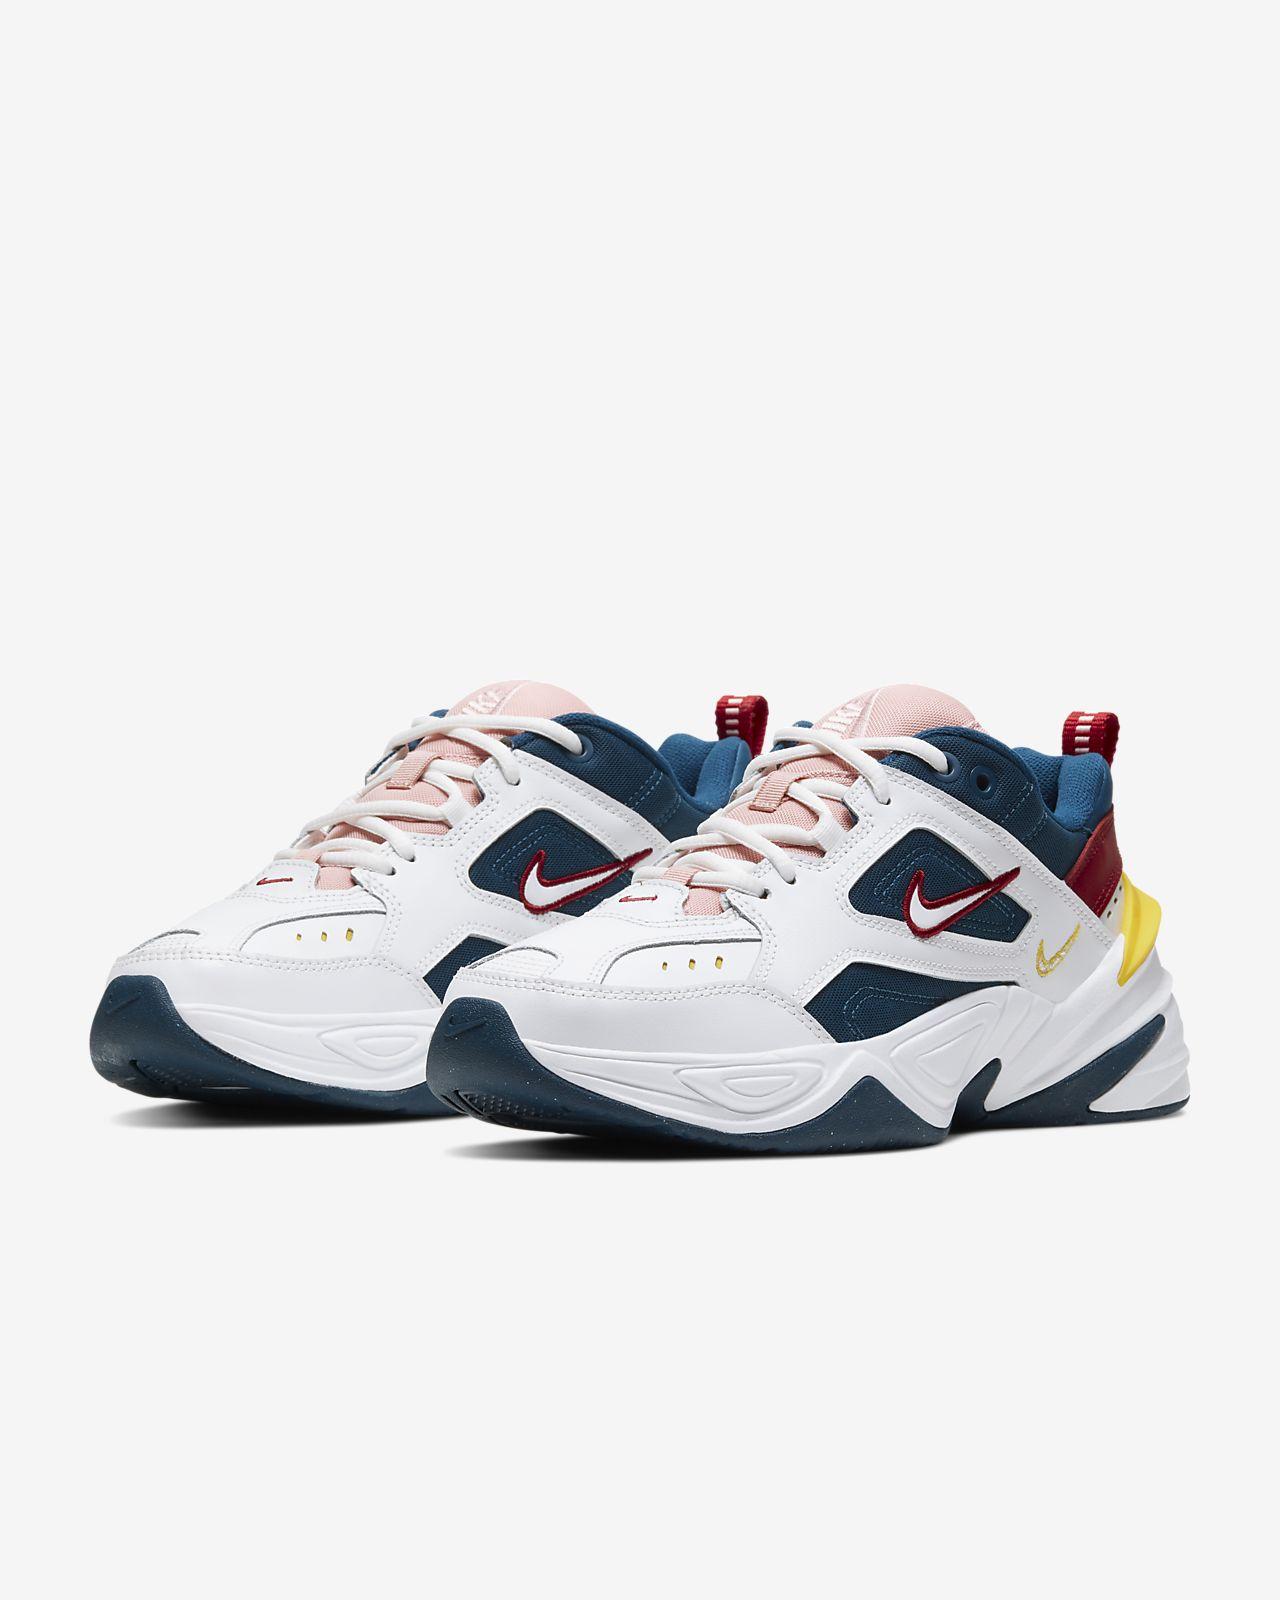 Nike Tekno Sale Sneakers & Sportschuhe Sale Bis zu 60